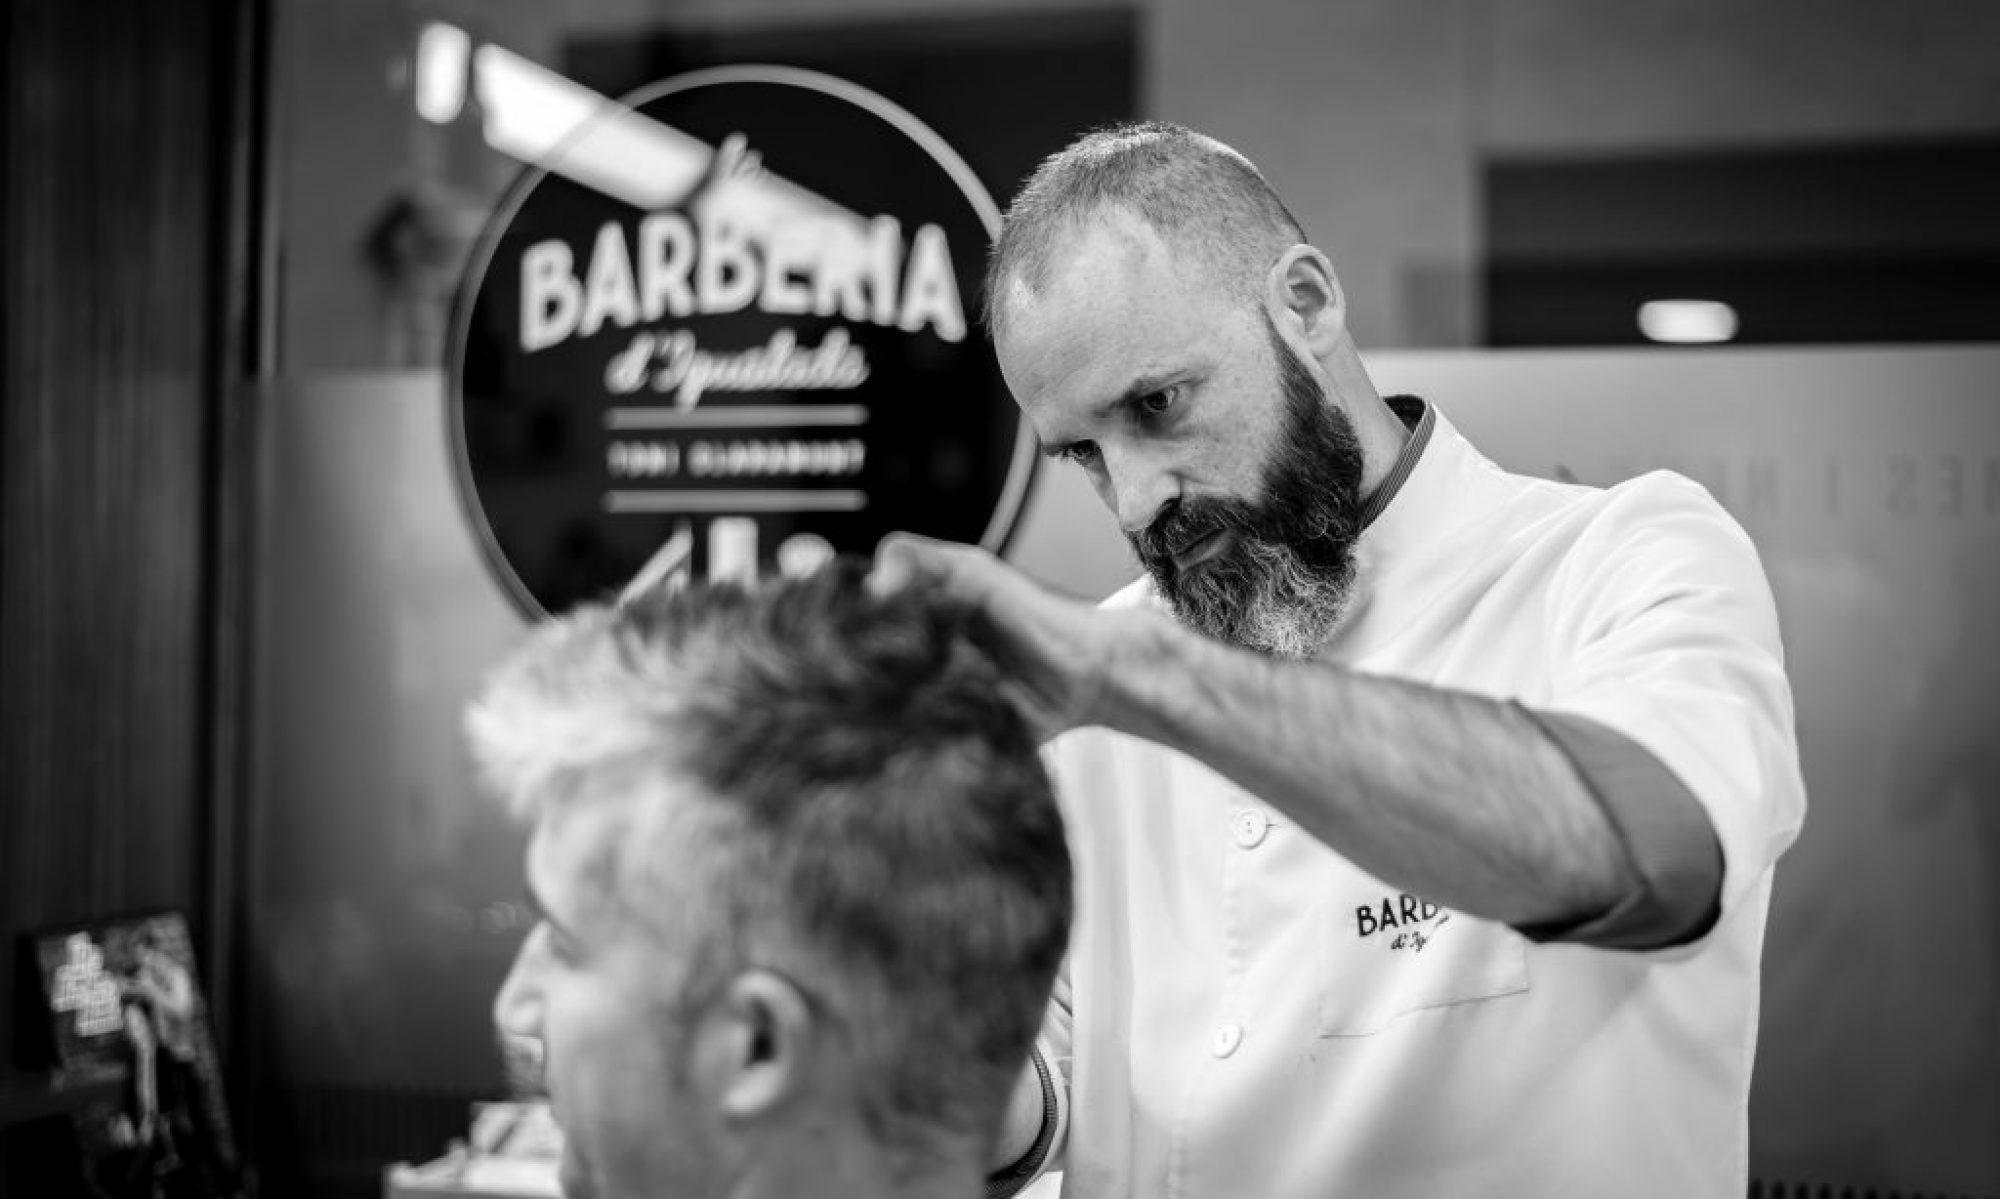 Barberia Igualada